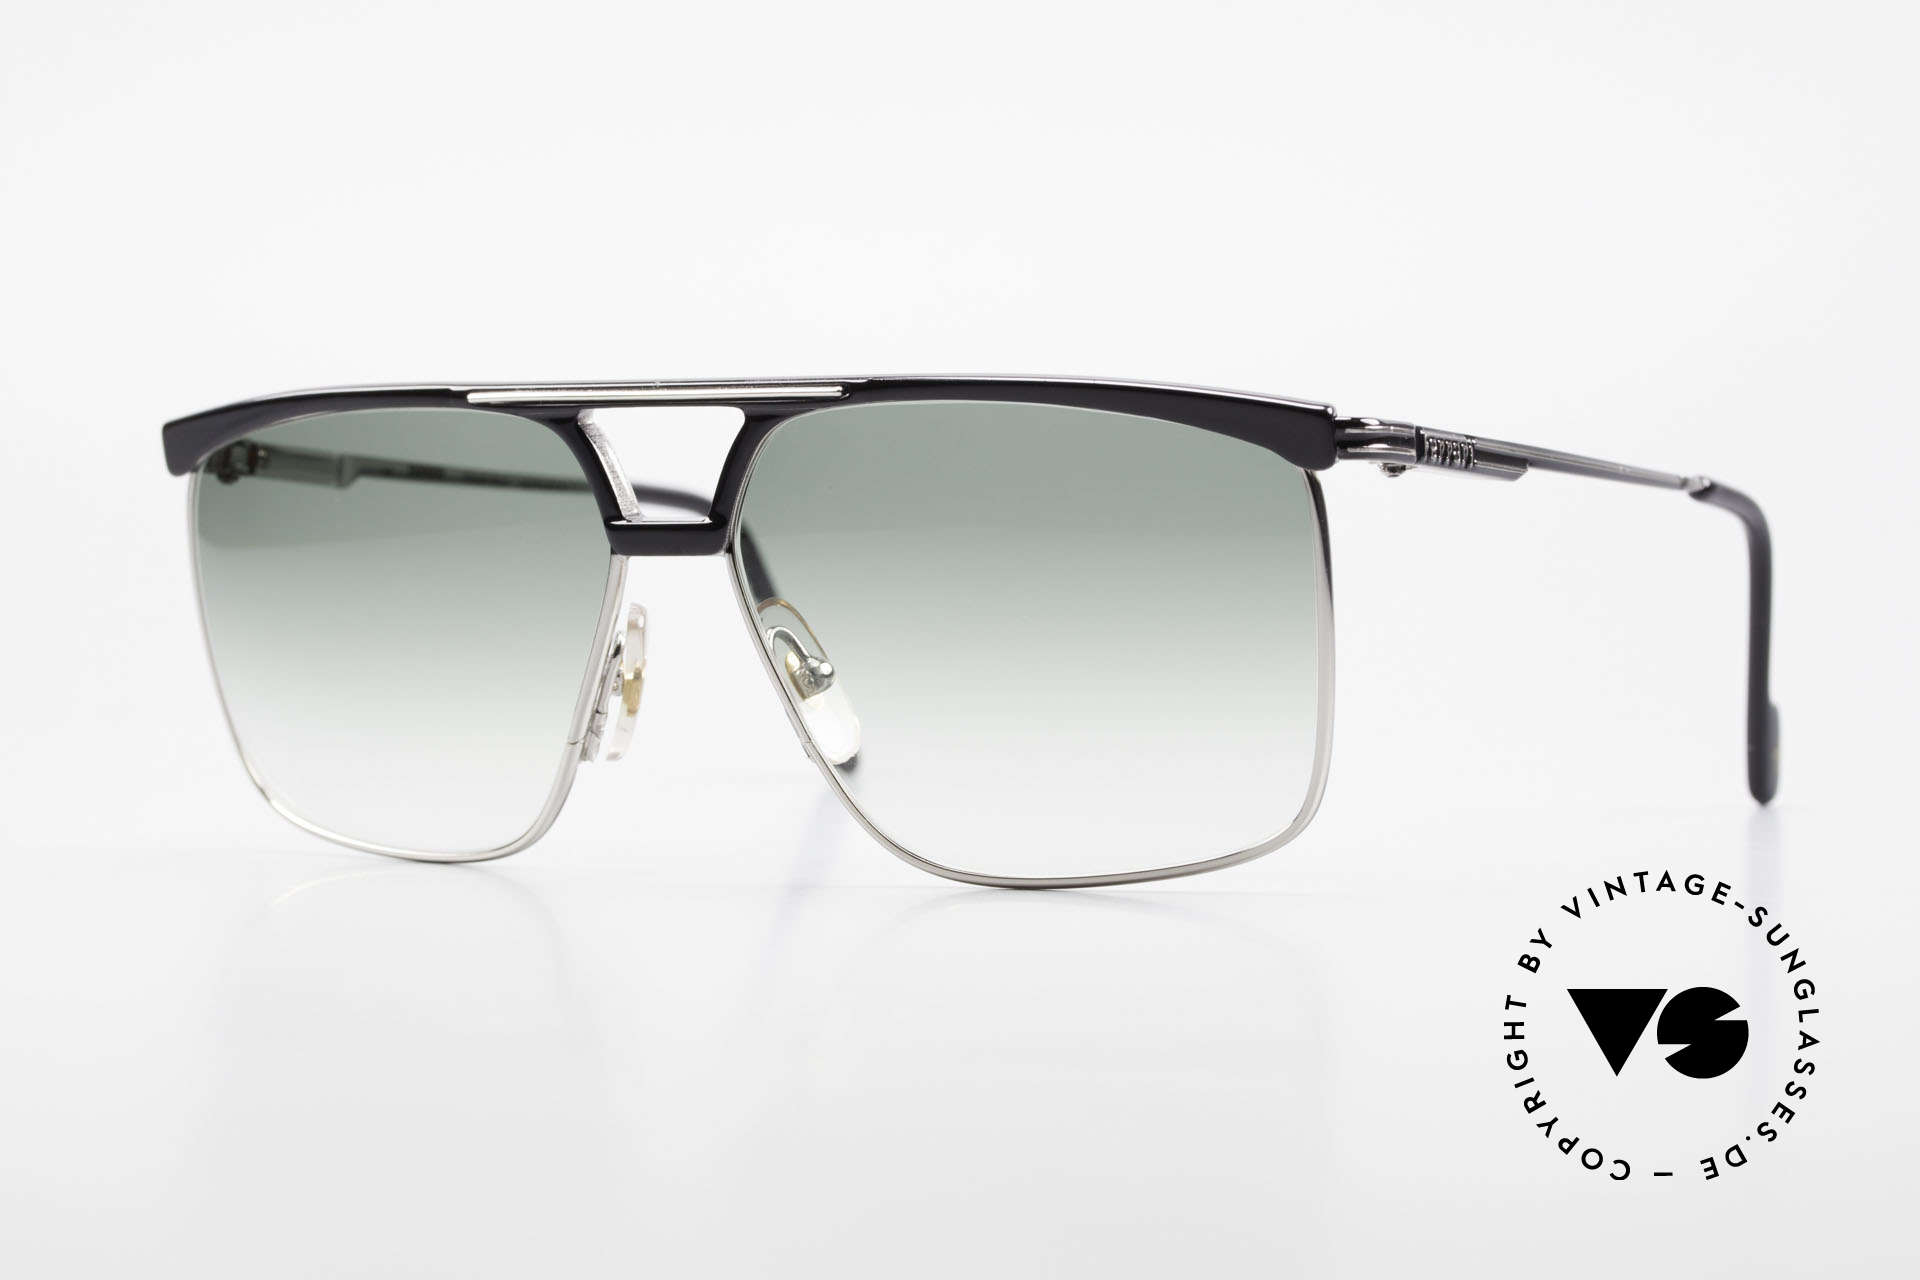 Ferrari F35 Alutanium Sunglasses Large, very masculine Ferrari FORMULA 1 vintage sunglasses, Made for Men